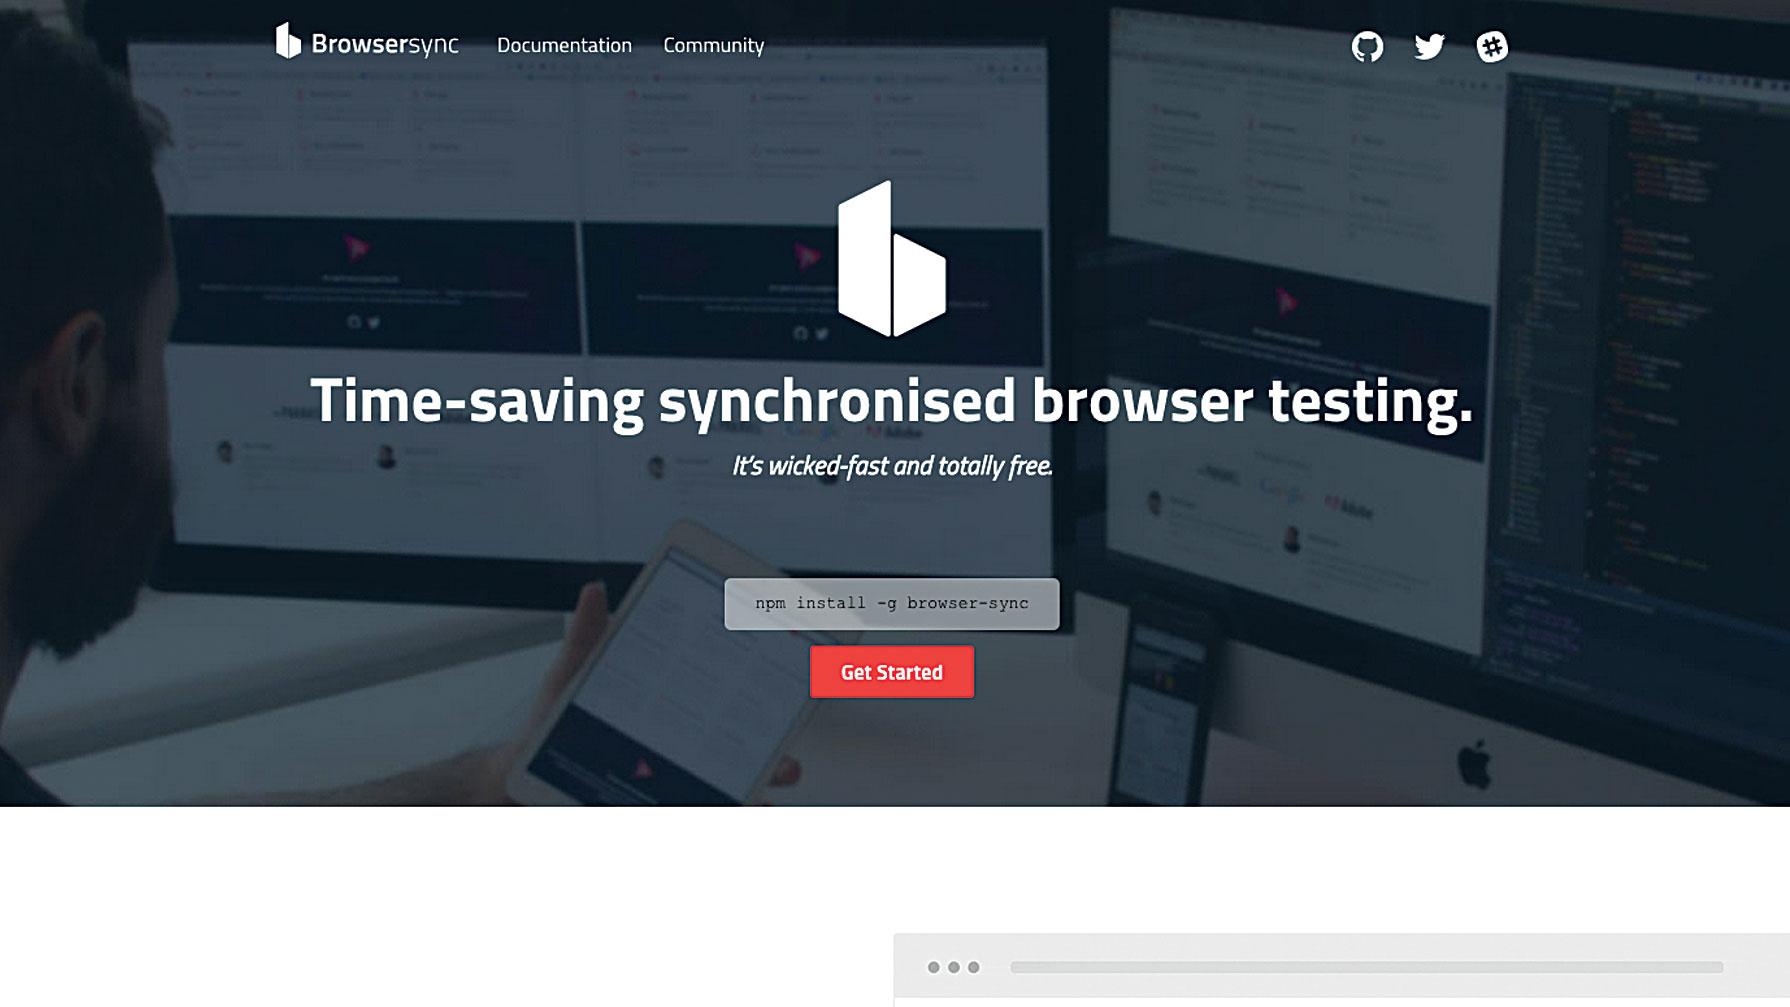 50 free web tools - Browsersync